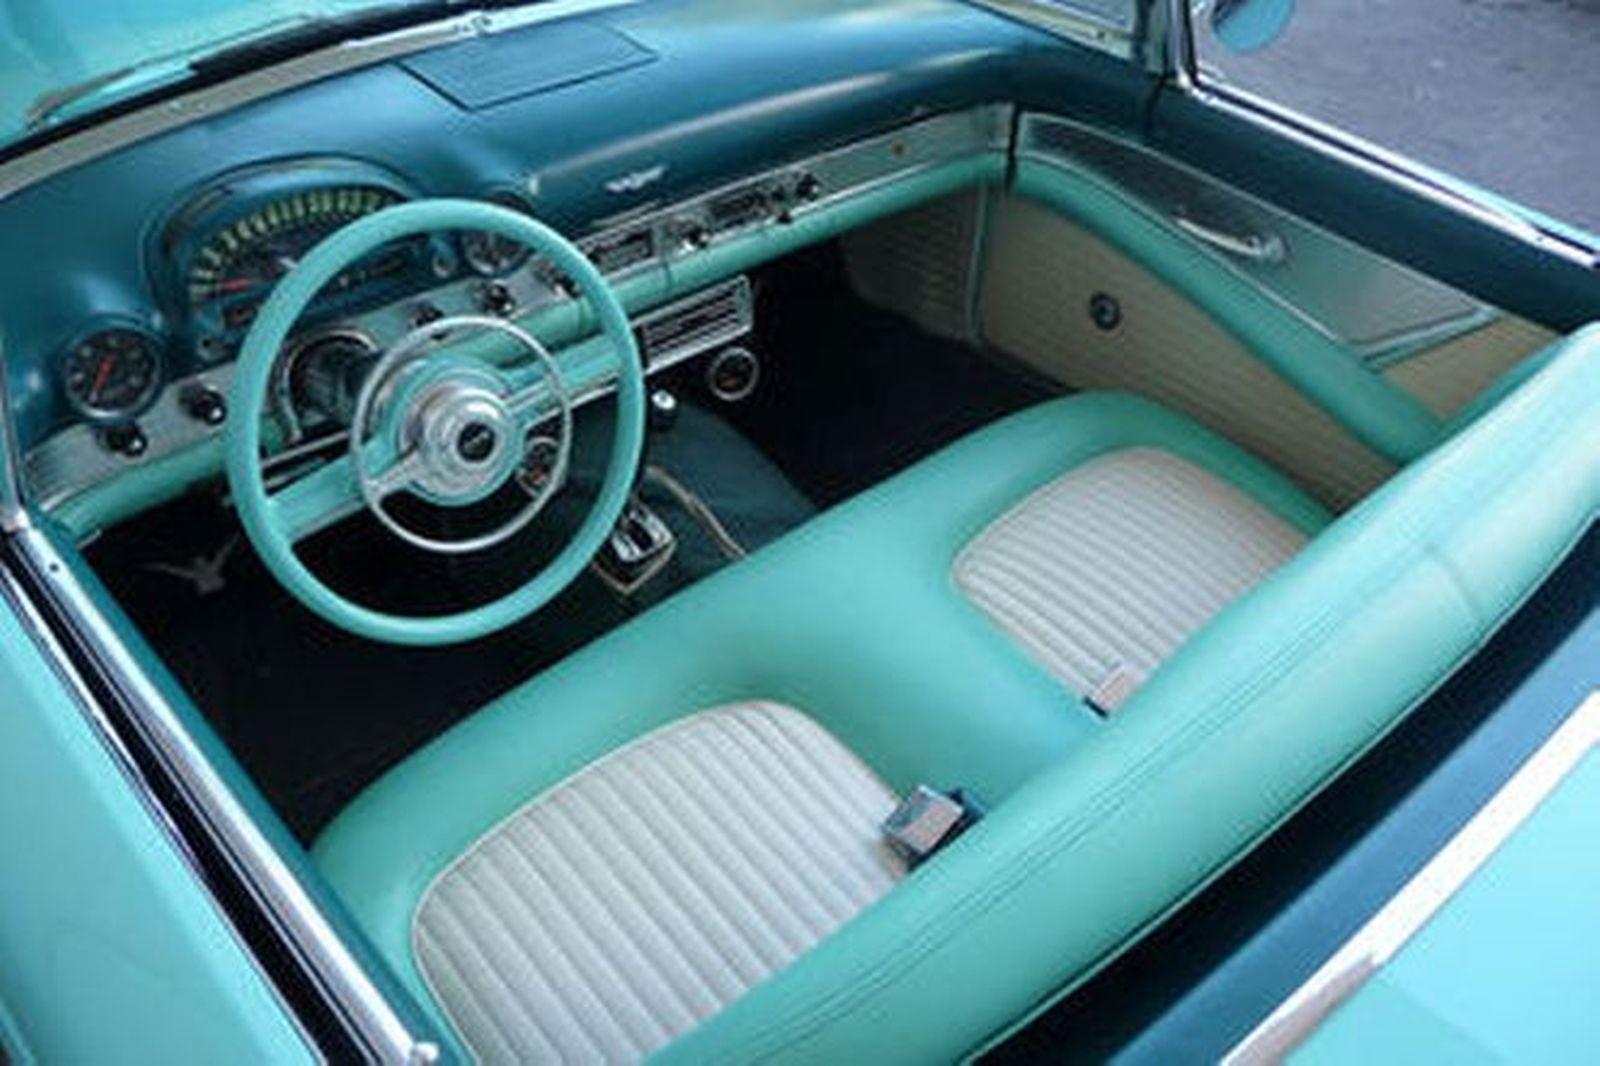 Ford Thunderbird Convertible (LHD)